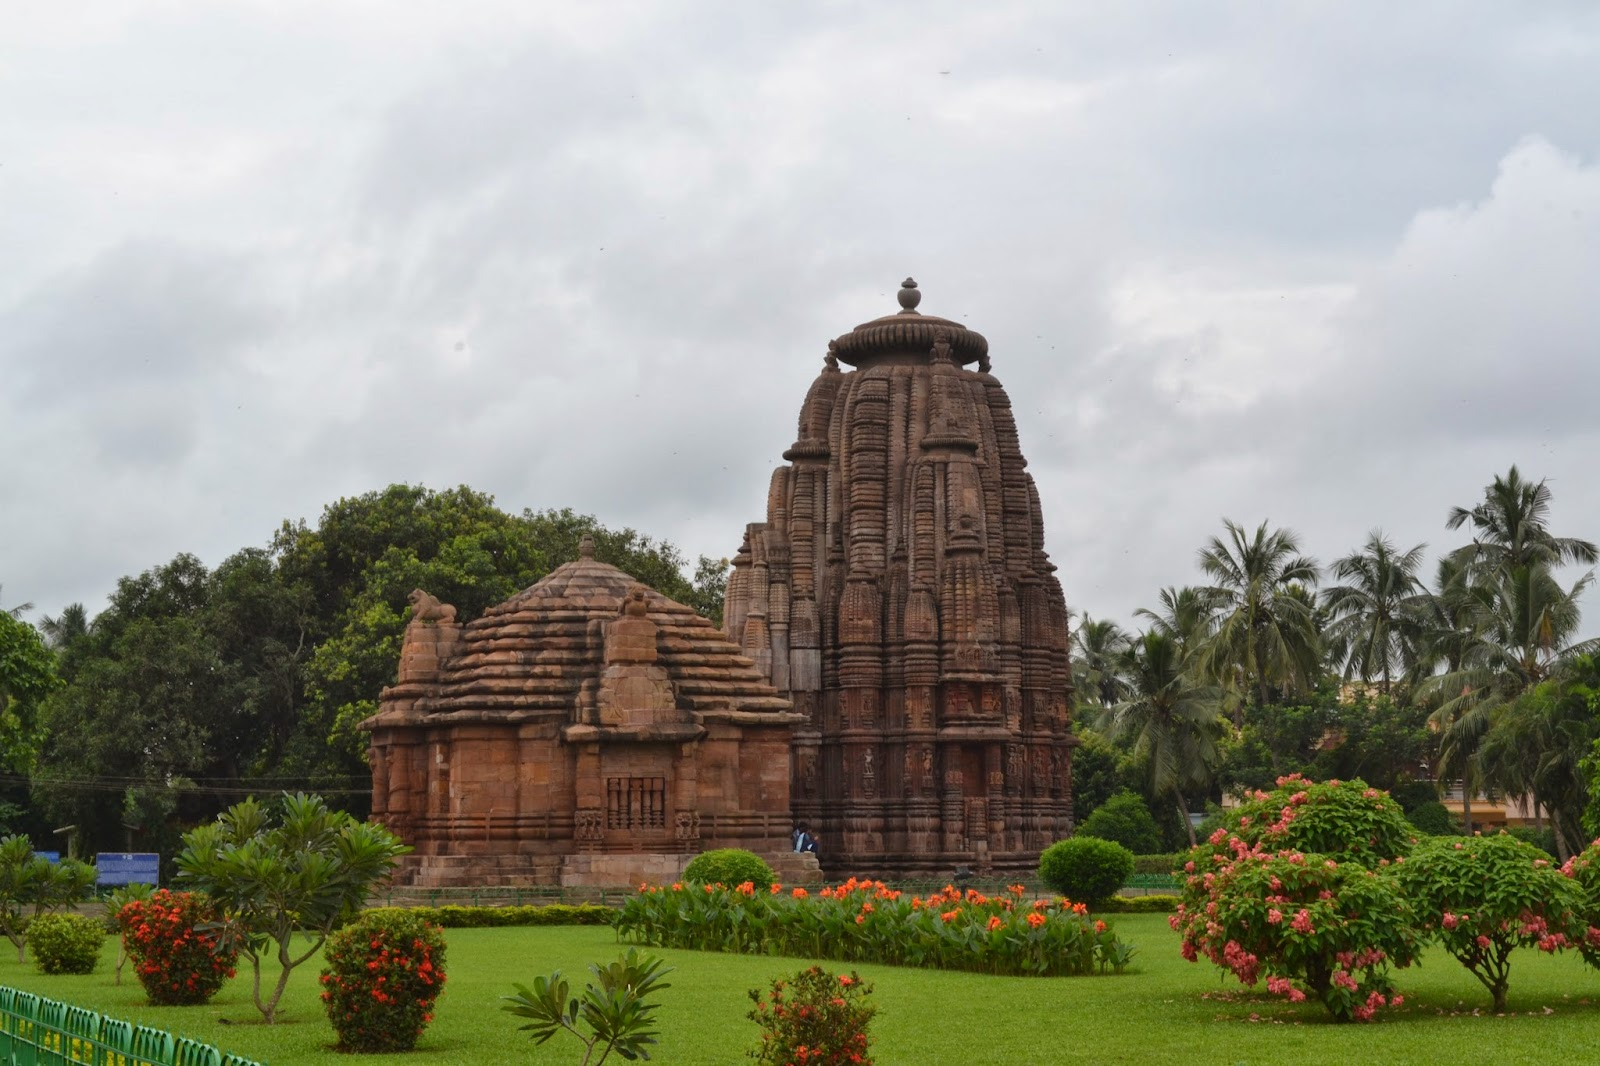 Rajarani temple in bhubansewar